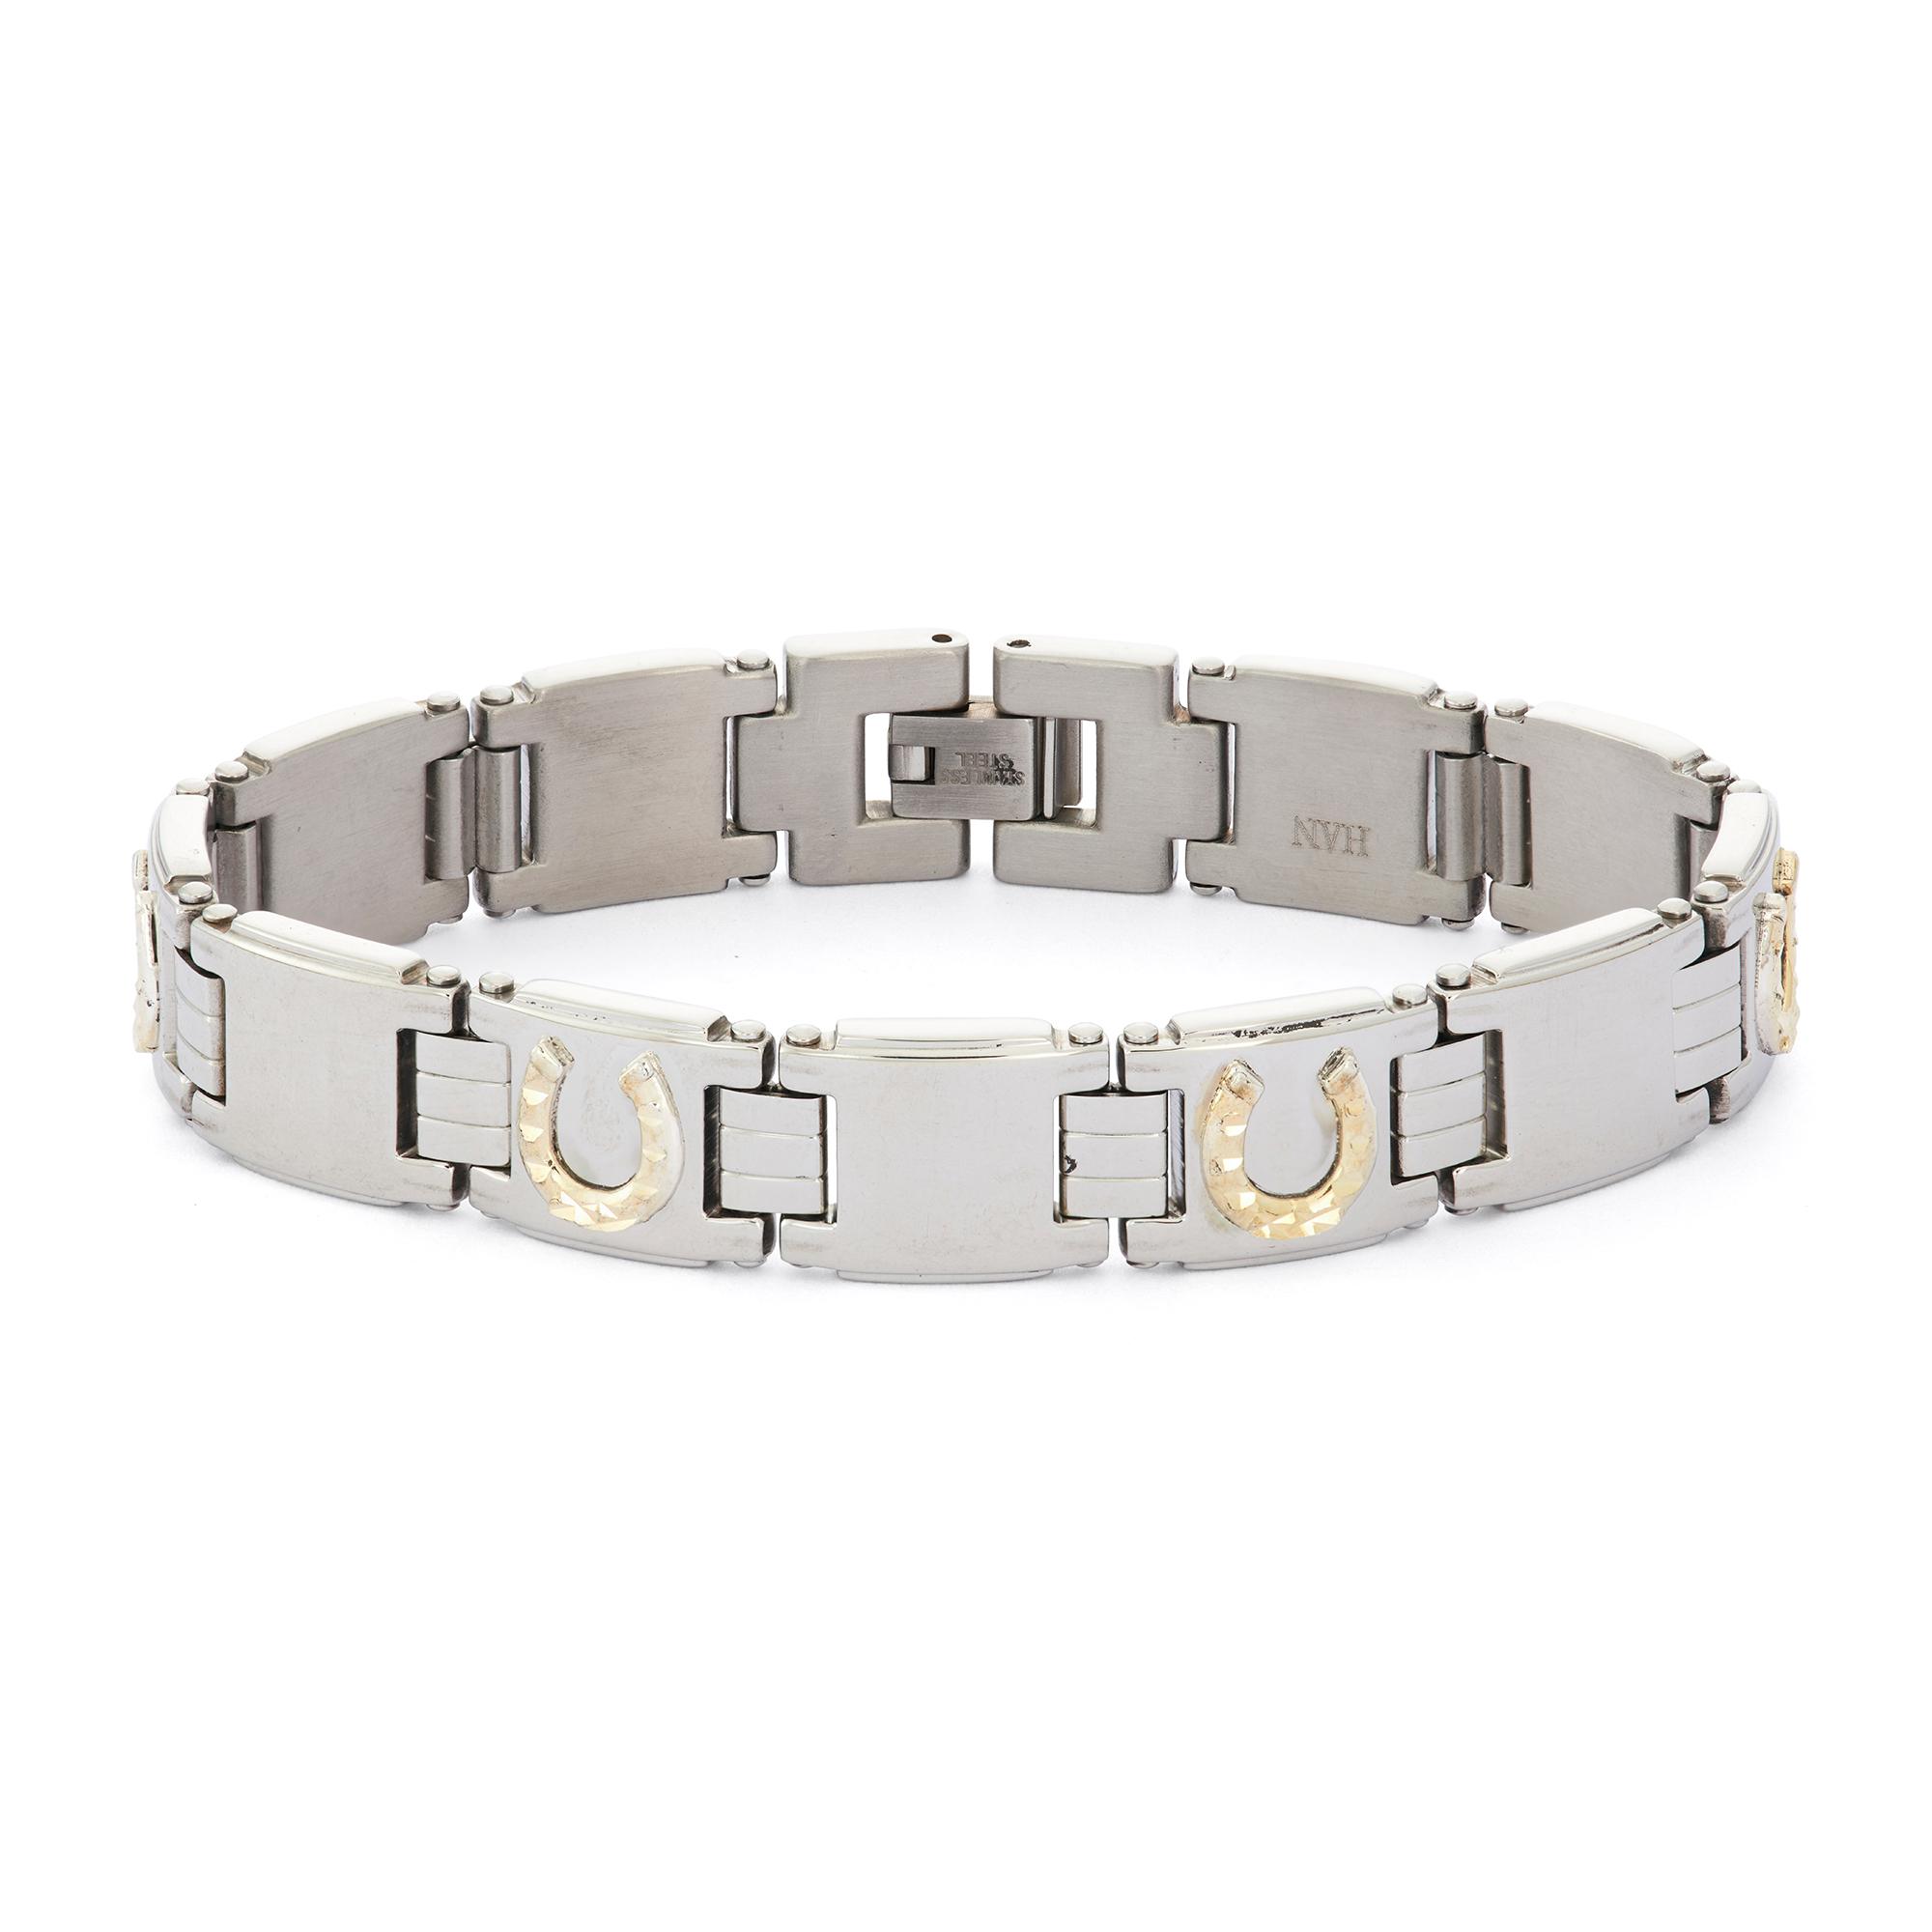 Stainless Steel Two-Tone Horseshoe Bracelet